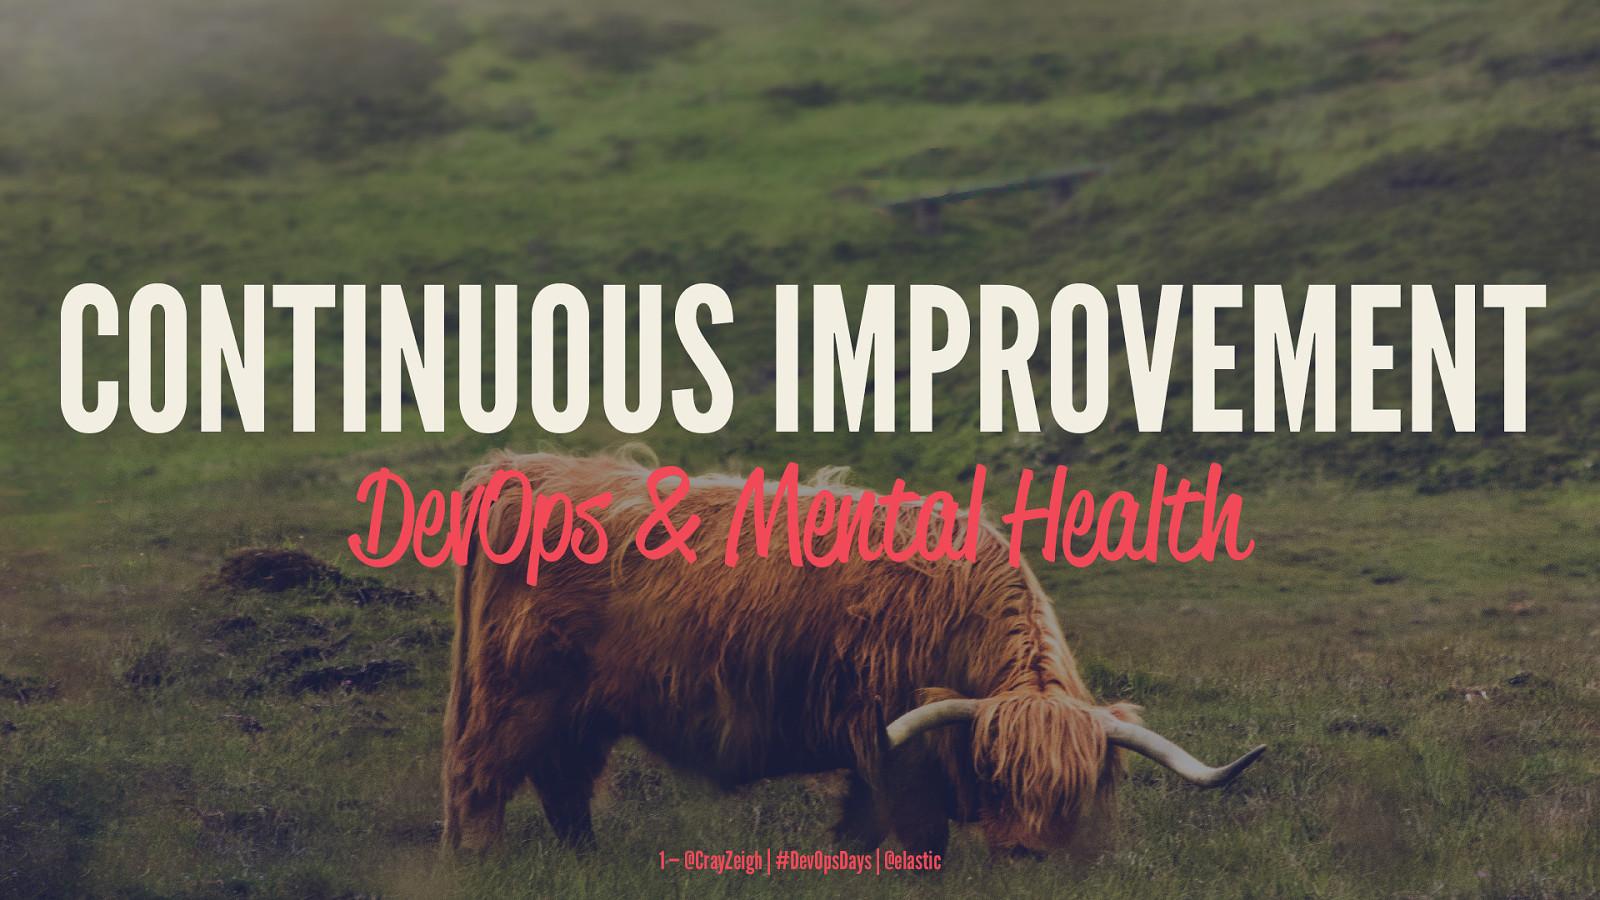 Continuous Improvement: DevOps and Mental Illness